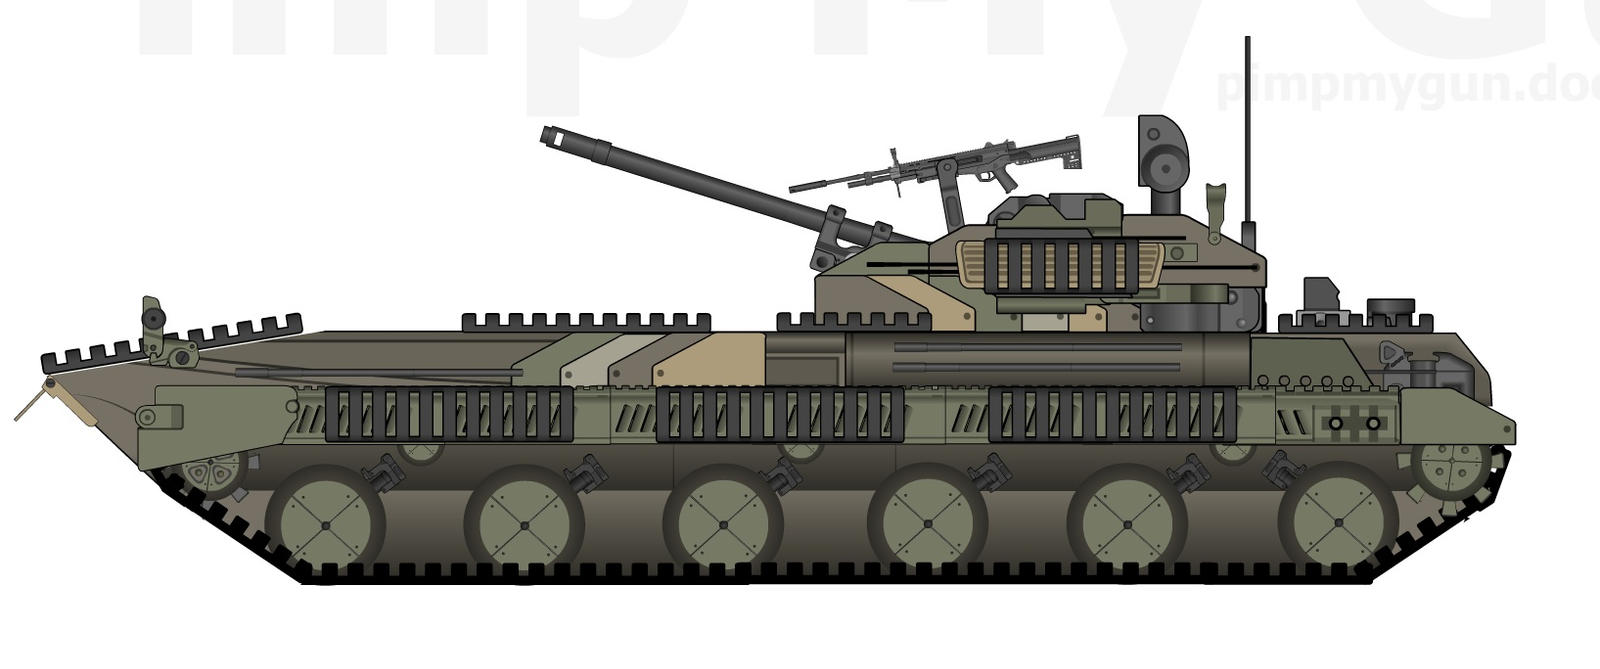 BZK-78 by dirtbiker715